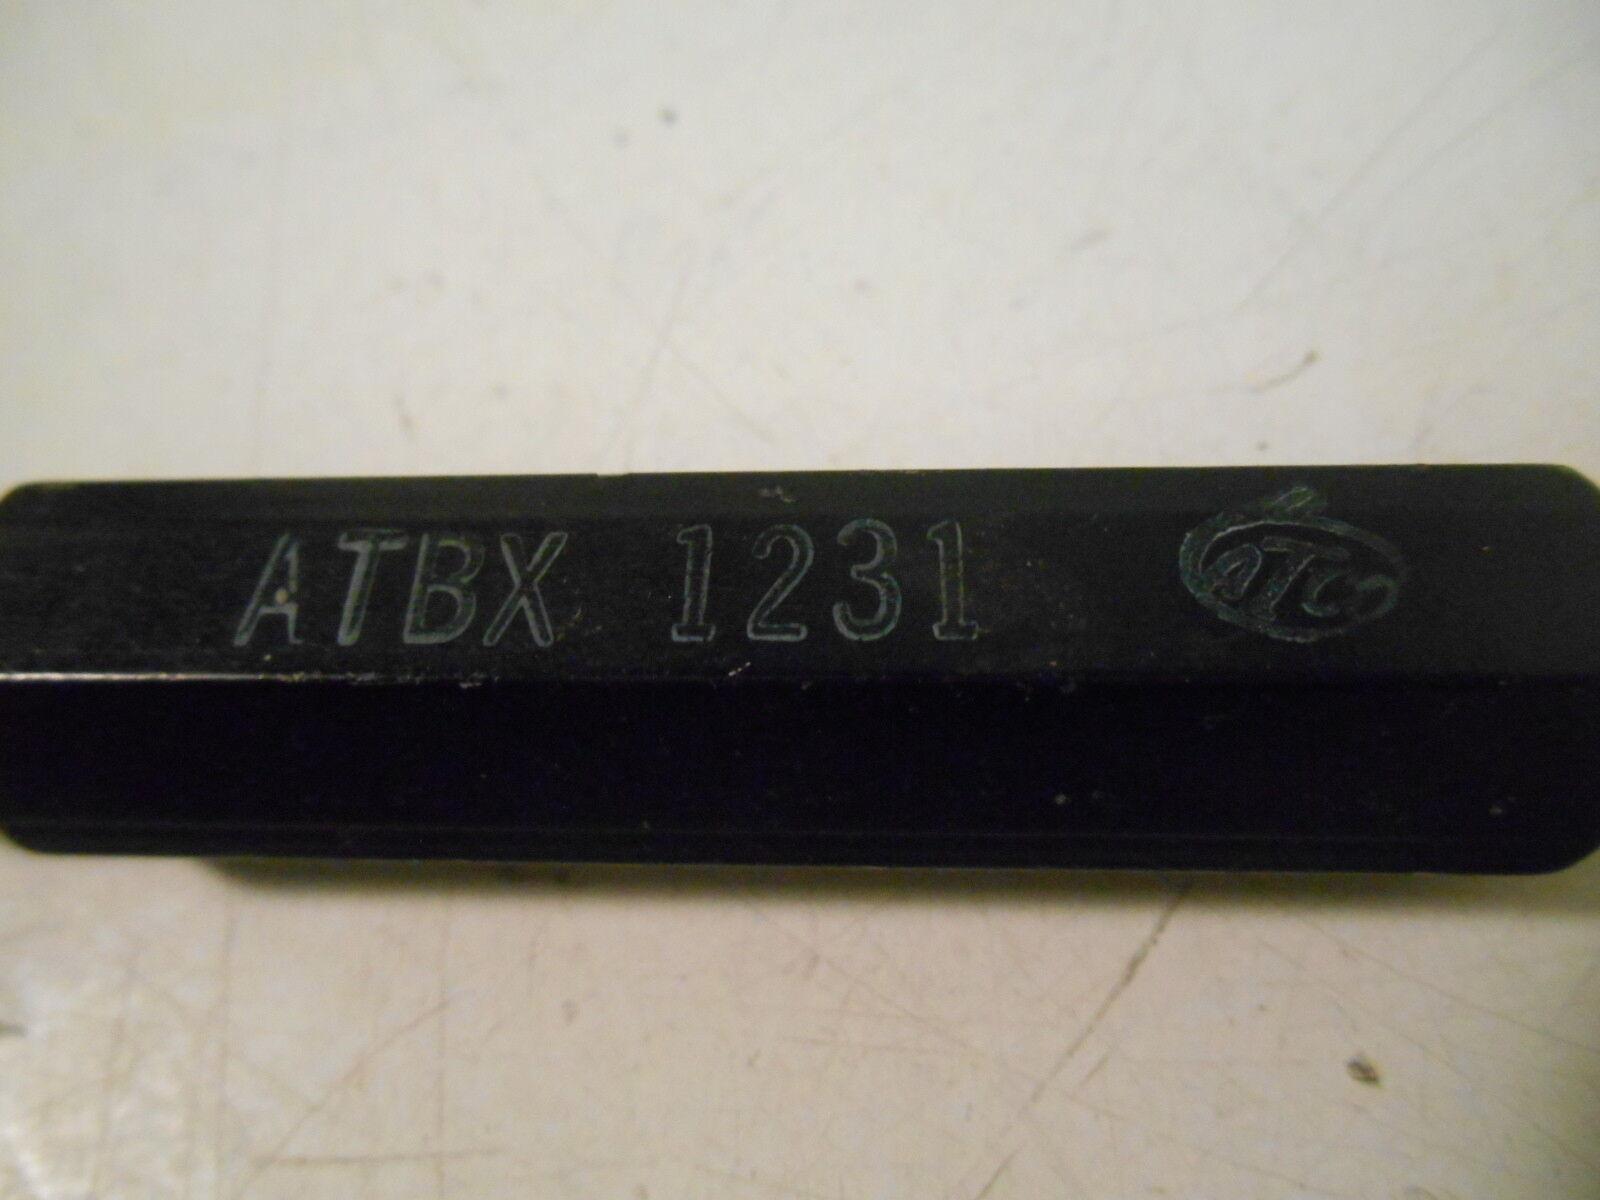 ATCO Removal Tool ATBX 2288 Lot of 2